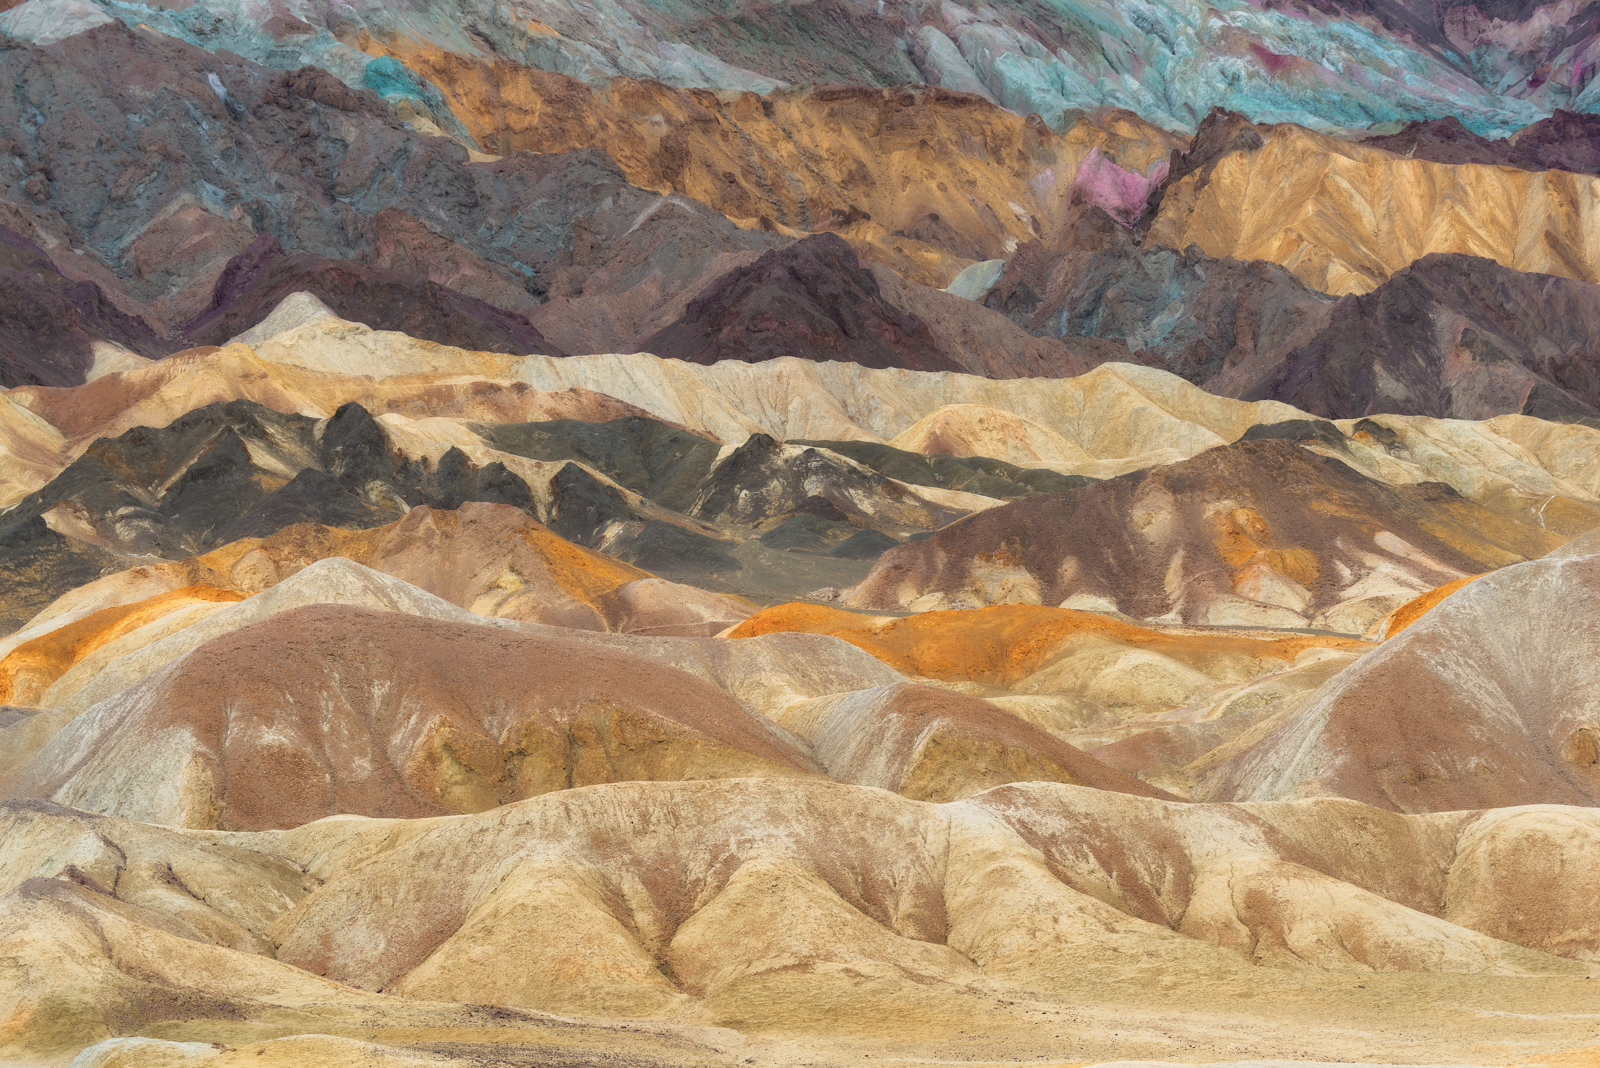 JR_DValley_20_Mule_Canyon-Reduced Sat